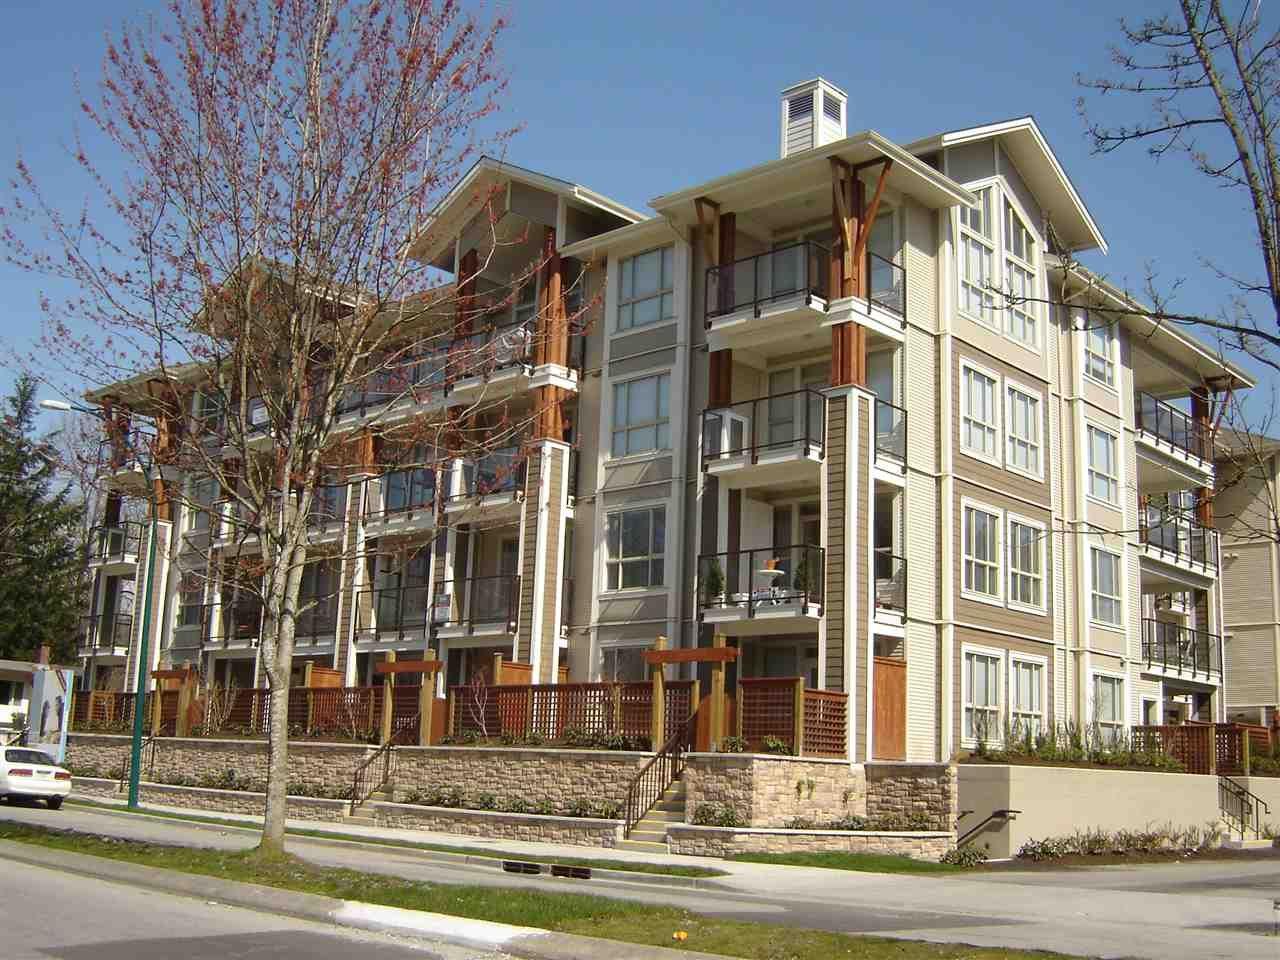 "Main Photo: 109 2484 WILSON Avenue in Port Coquitlam: Central Pt Coquitlam Condo for sale in ""VERDE"" : MLS®# R2028331"